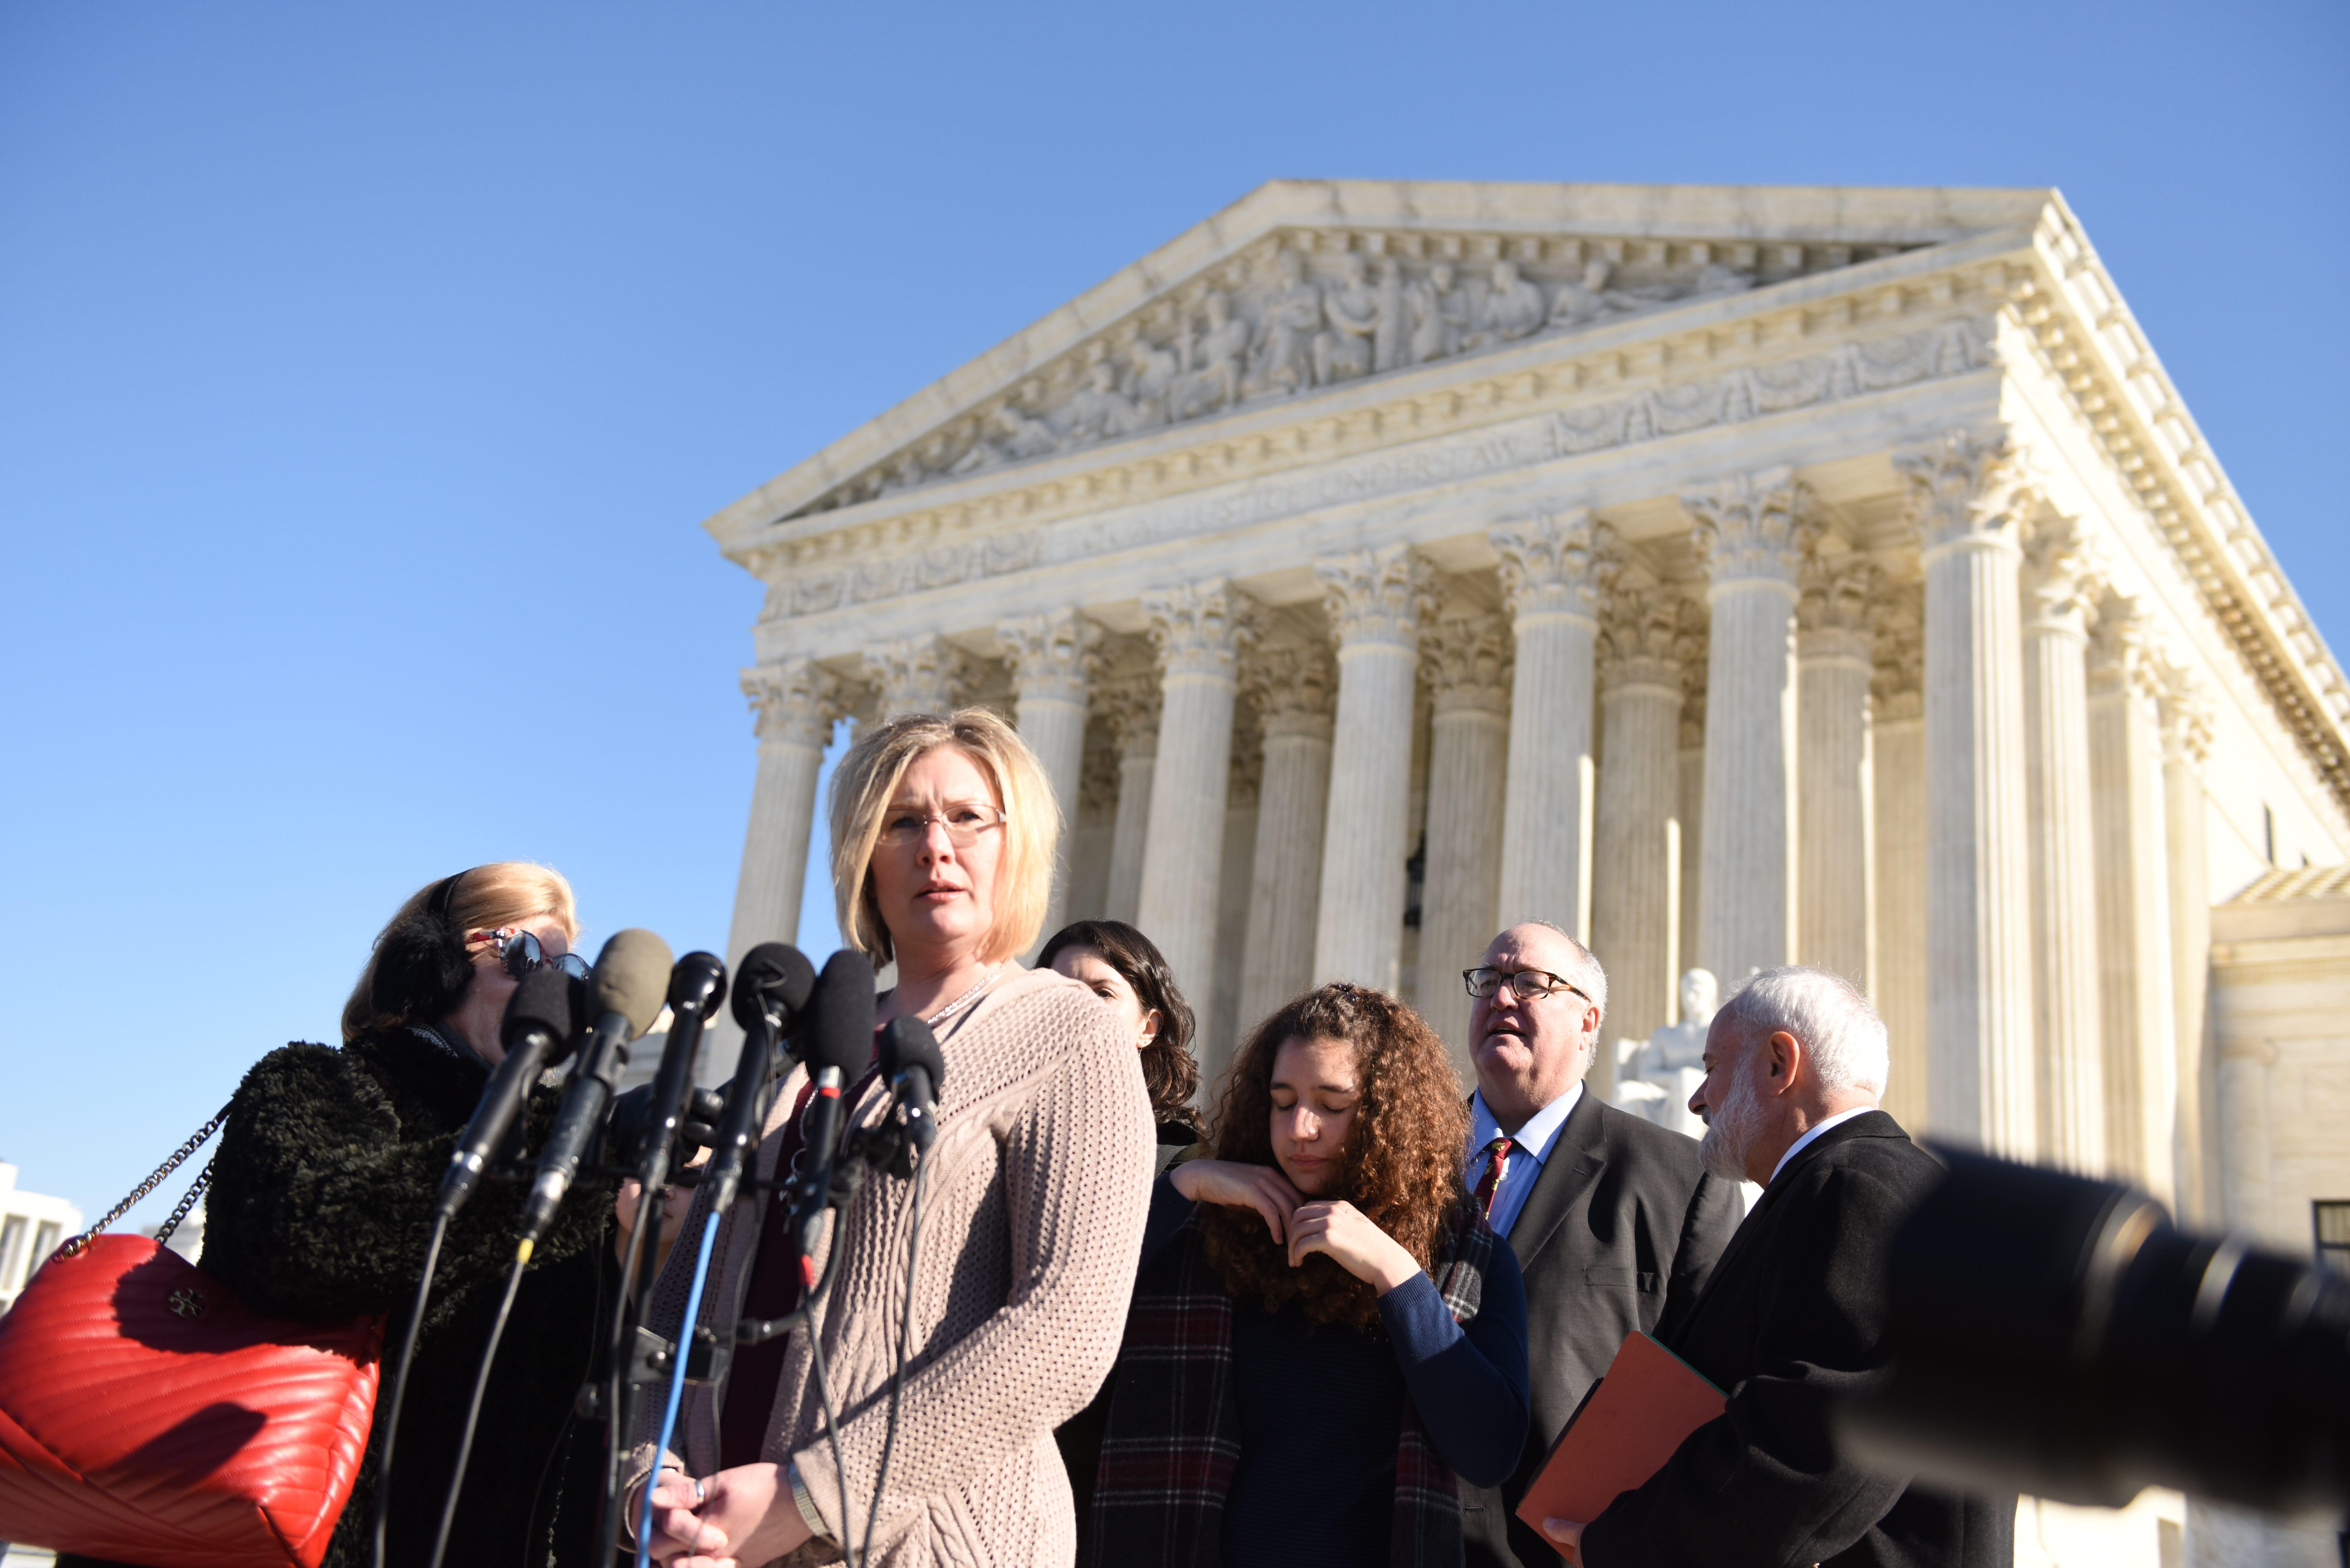 Supreme Court makes religious school education eligible for public aid